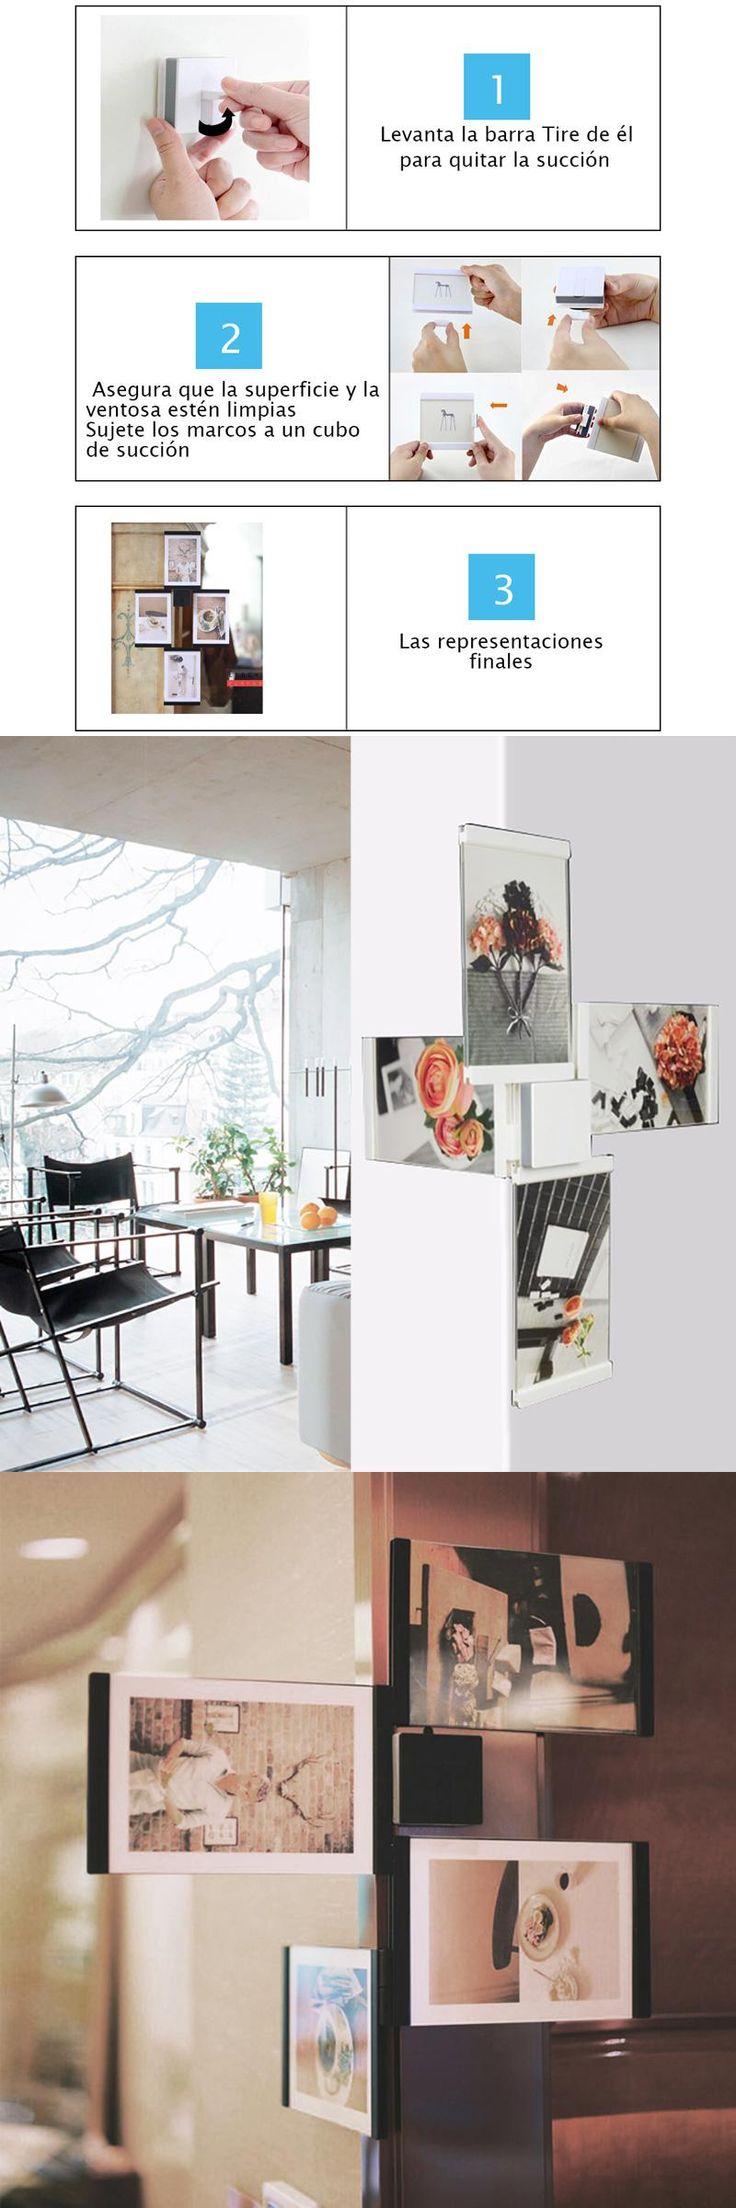 25+ unique Acrylic photo frames ideas on Pinterest | Acrylic photo ...